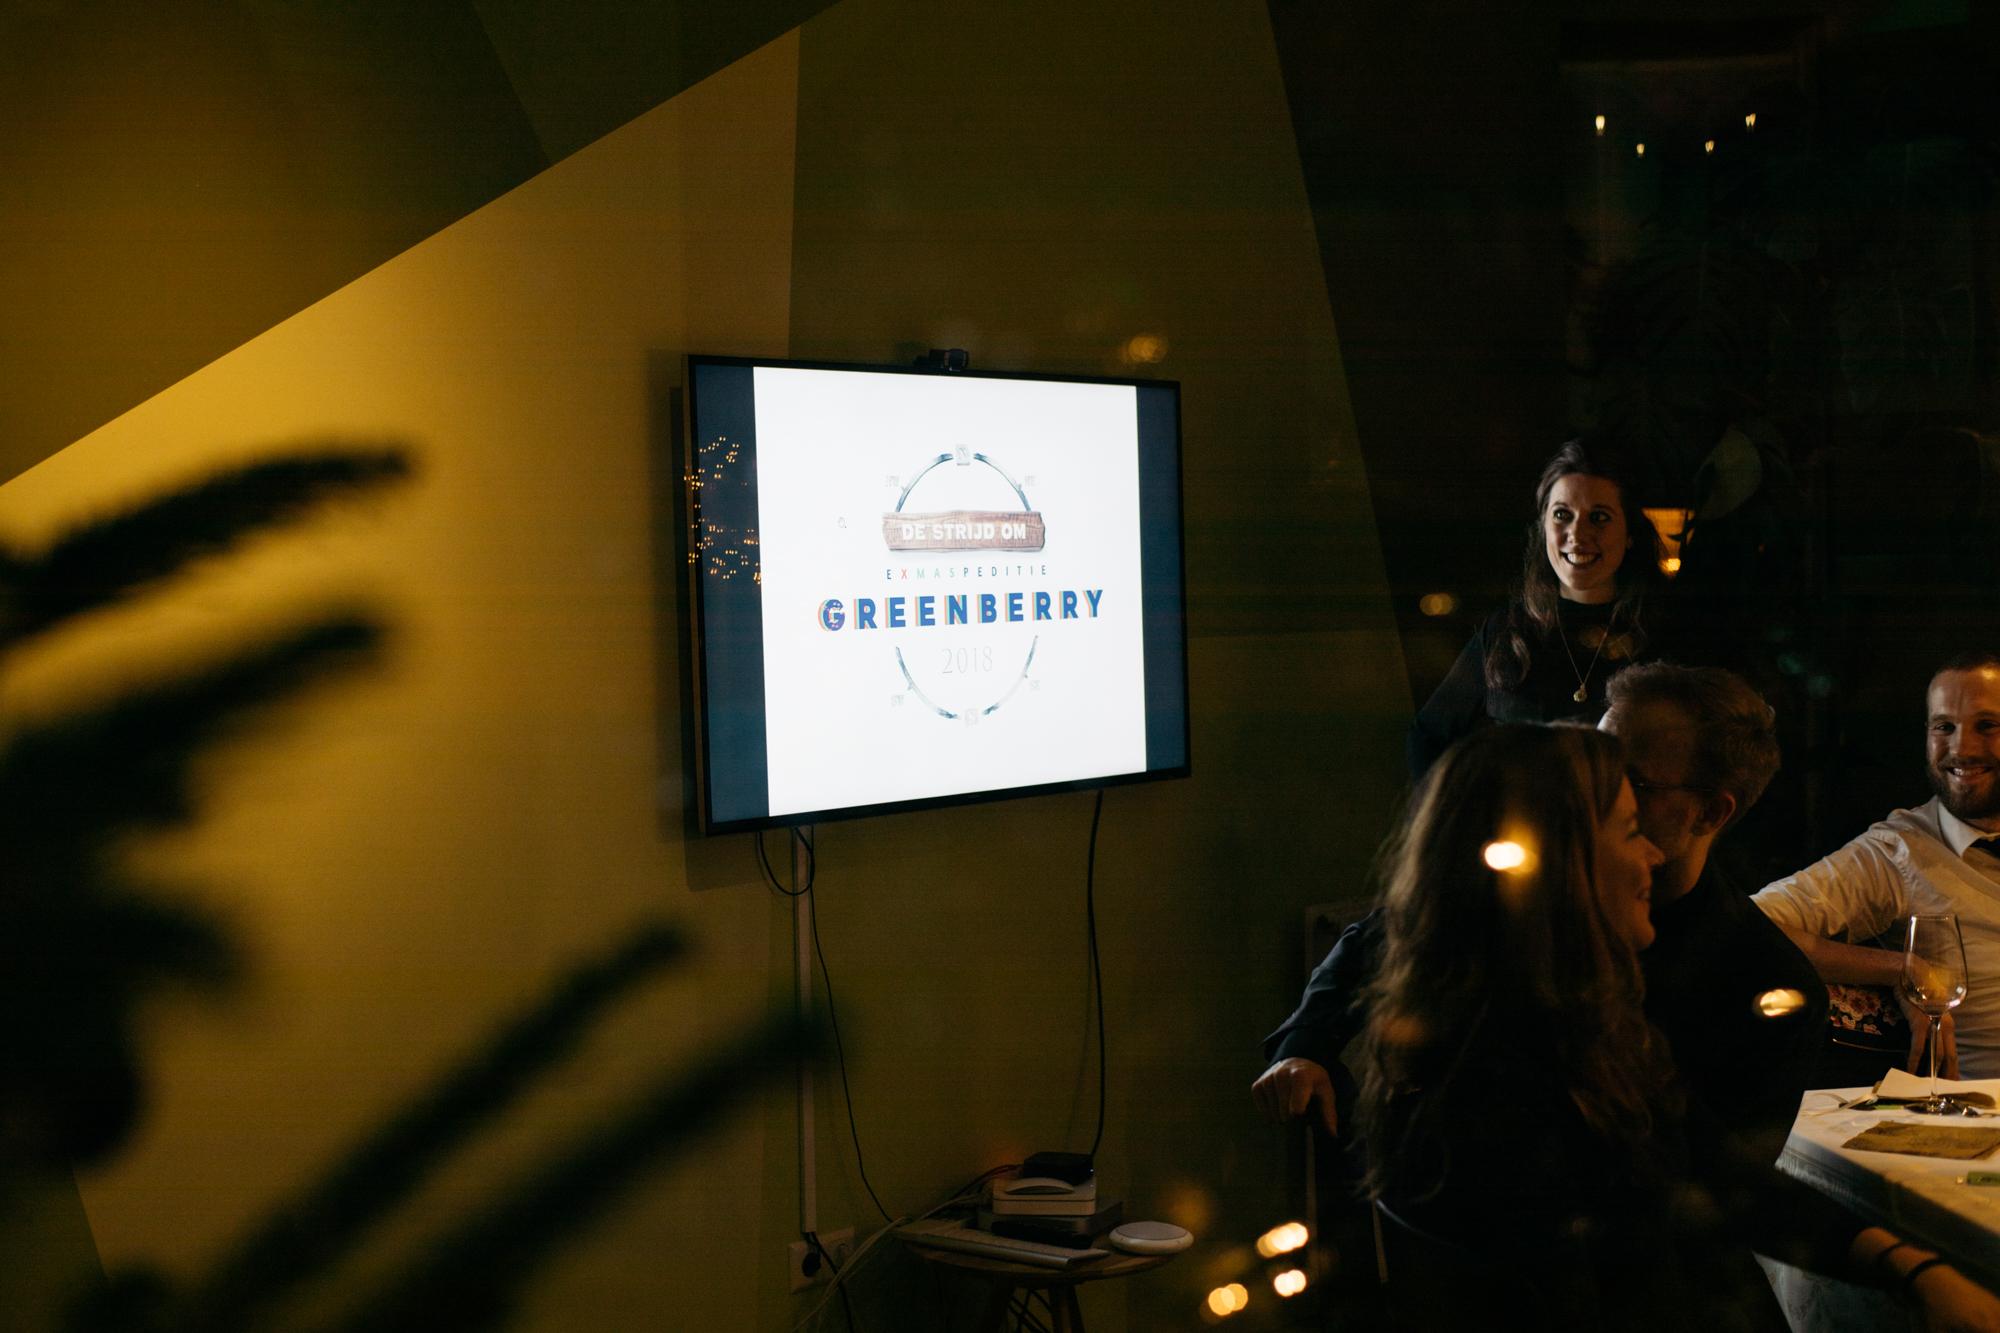 Greenberry_Kerst2018-Pimvb119.jpg